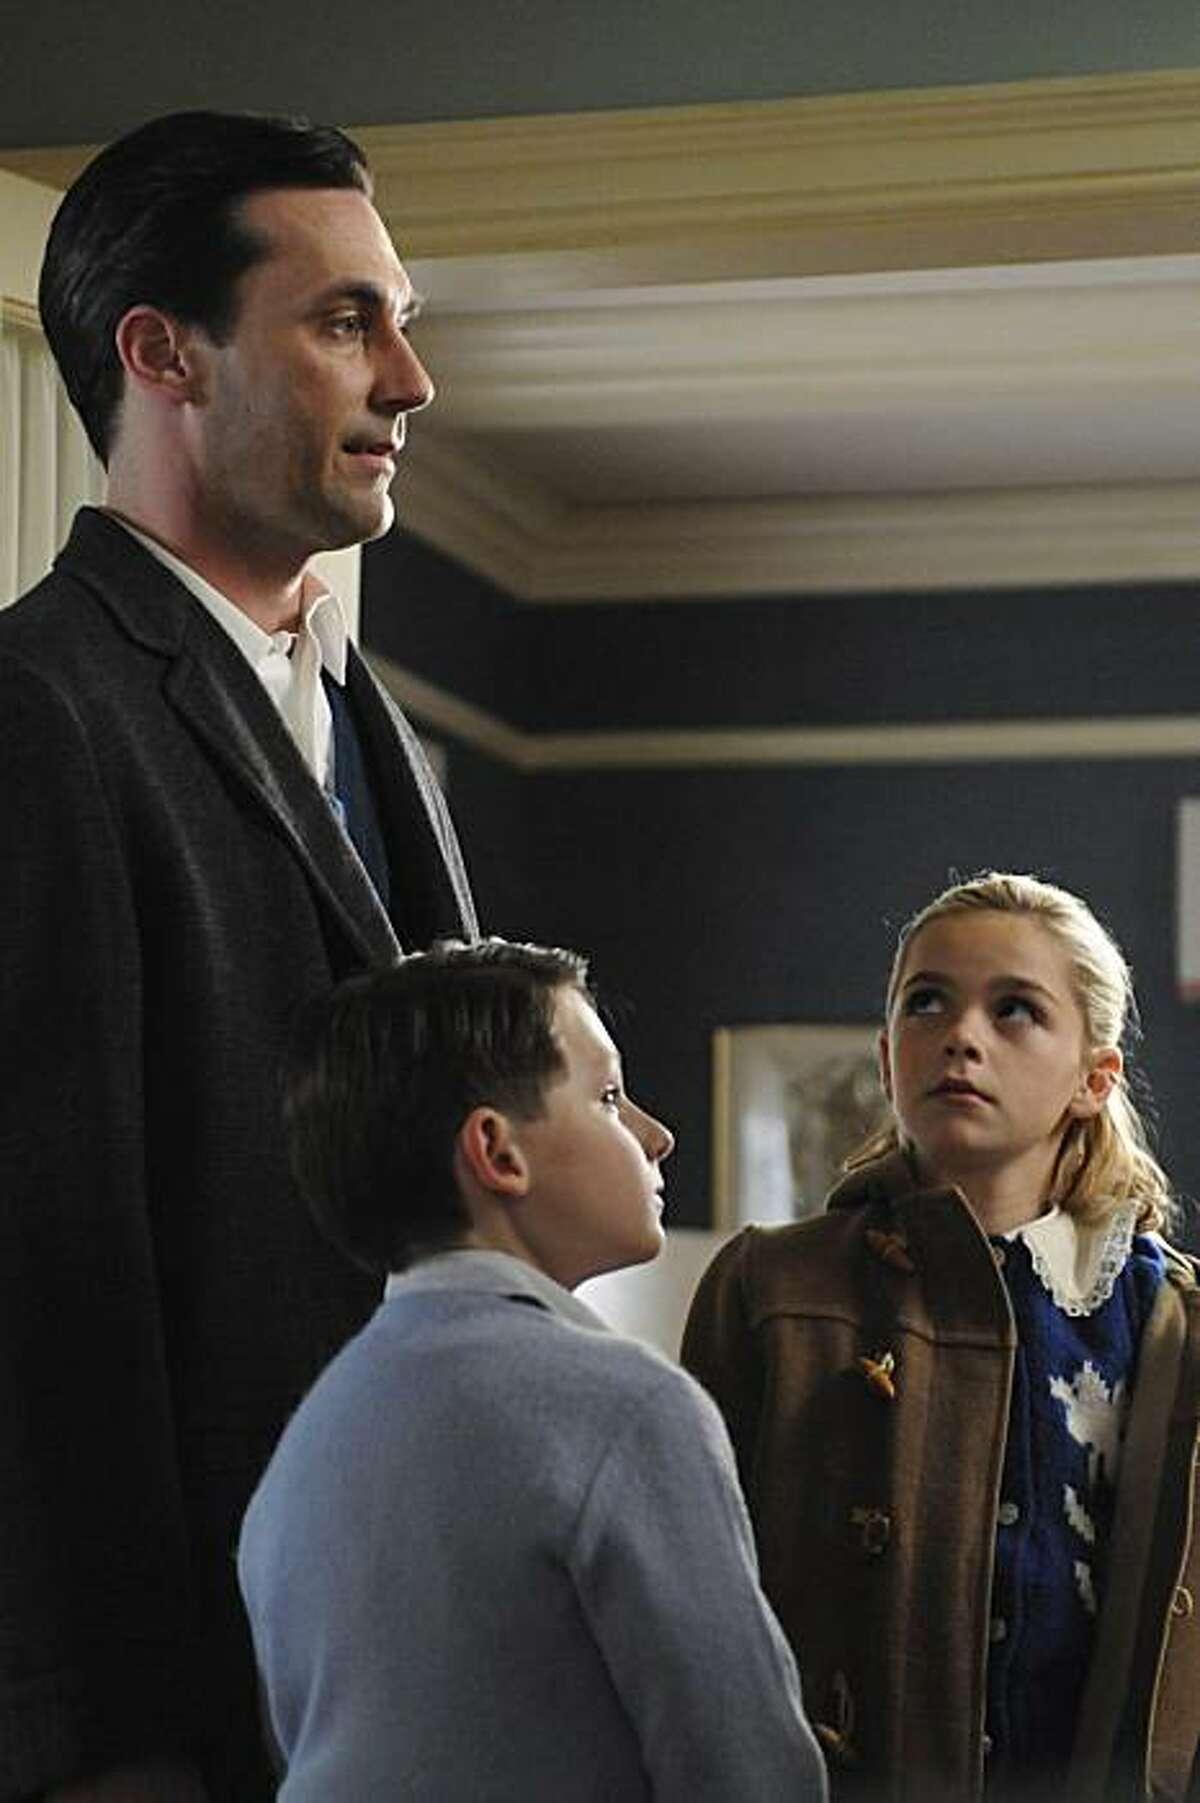 Don Draper (Jon Hamm), Sally Draper (Kiernan Shipka) and Bobby Draper (Jared S. Gilmore) appear in Season 4 of